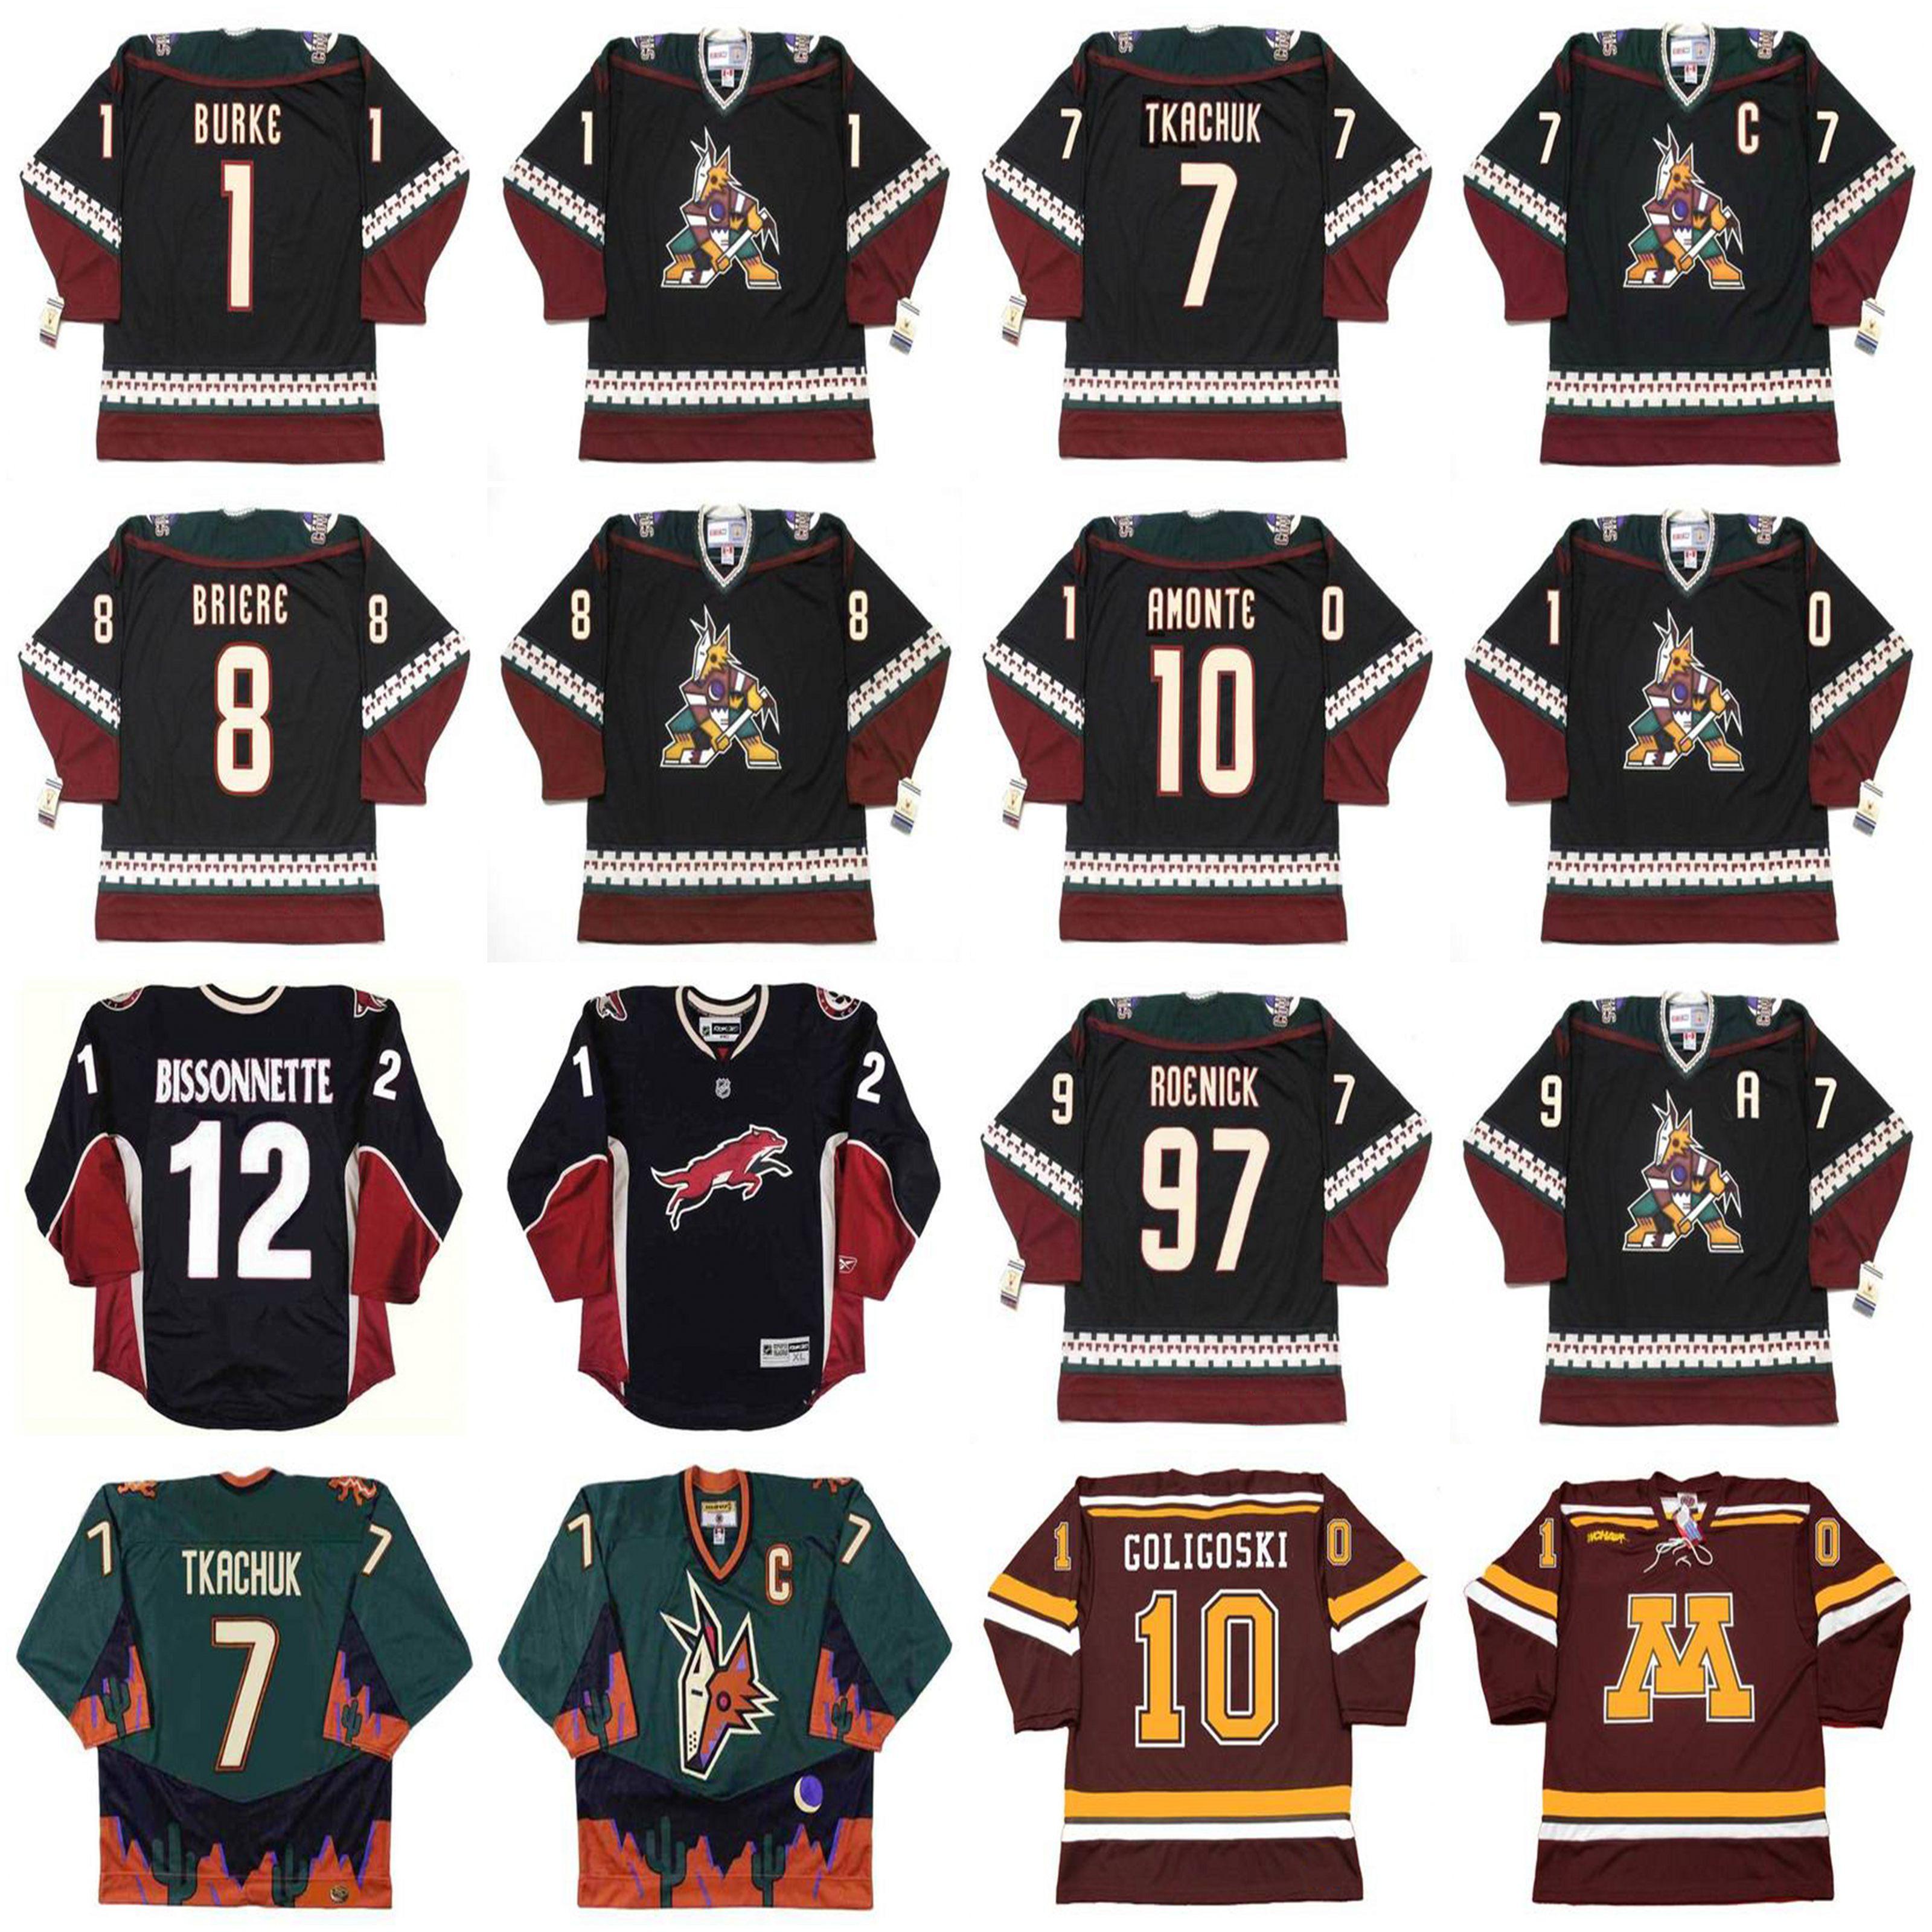 Phoenix Coyotes Hockey Jersey 1 SEAN BURKE 2001 TKACHUK 1998 BRIERE GOLIGOSKI AMONTE BISSONNETTE VRBATA DOAN LEMIEUX GARTNER TOCCHET NUMMINEN KHABIBULIN SMITH